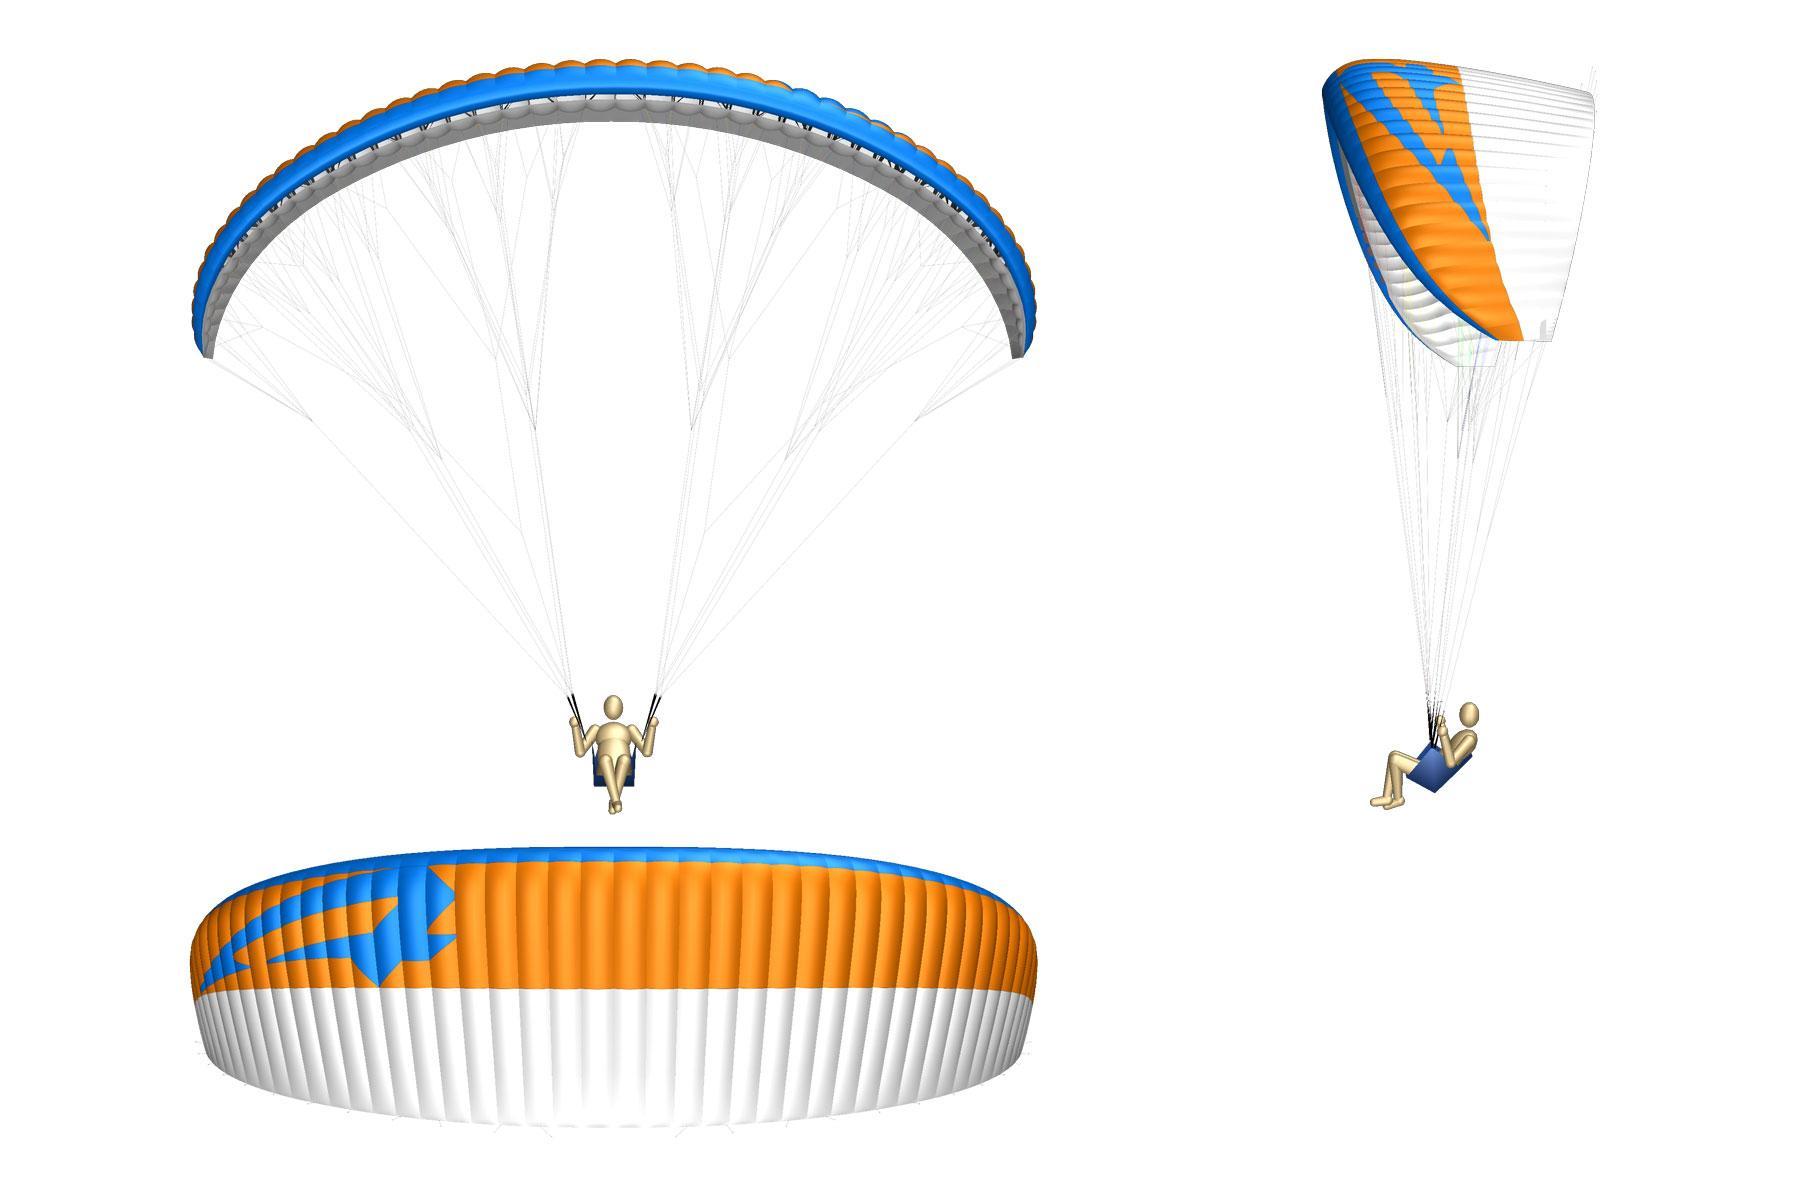 Hybrid - Apco Aviation Ltd